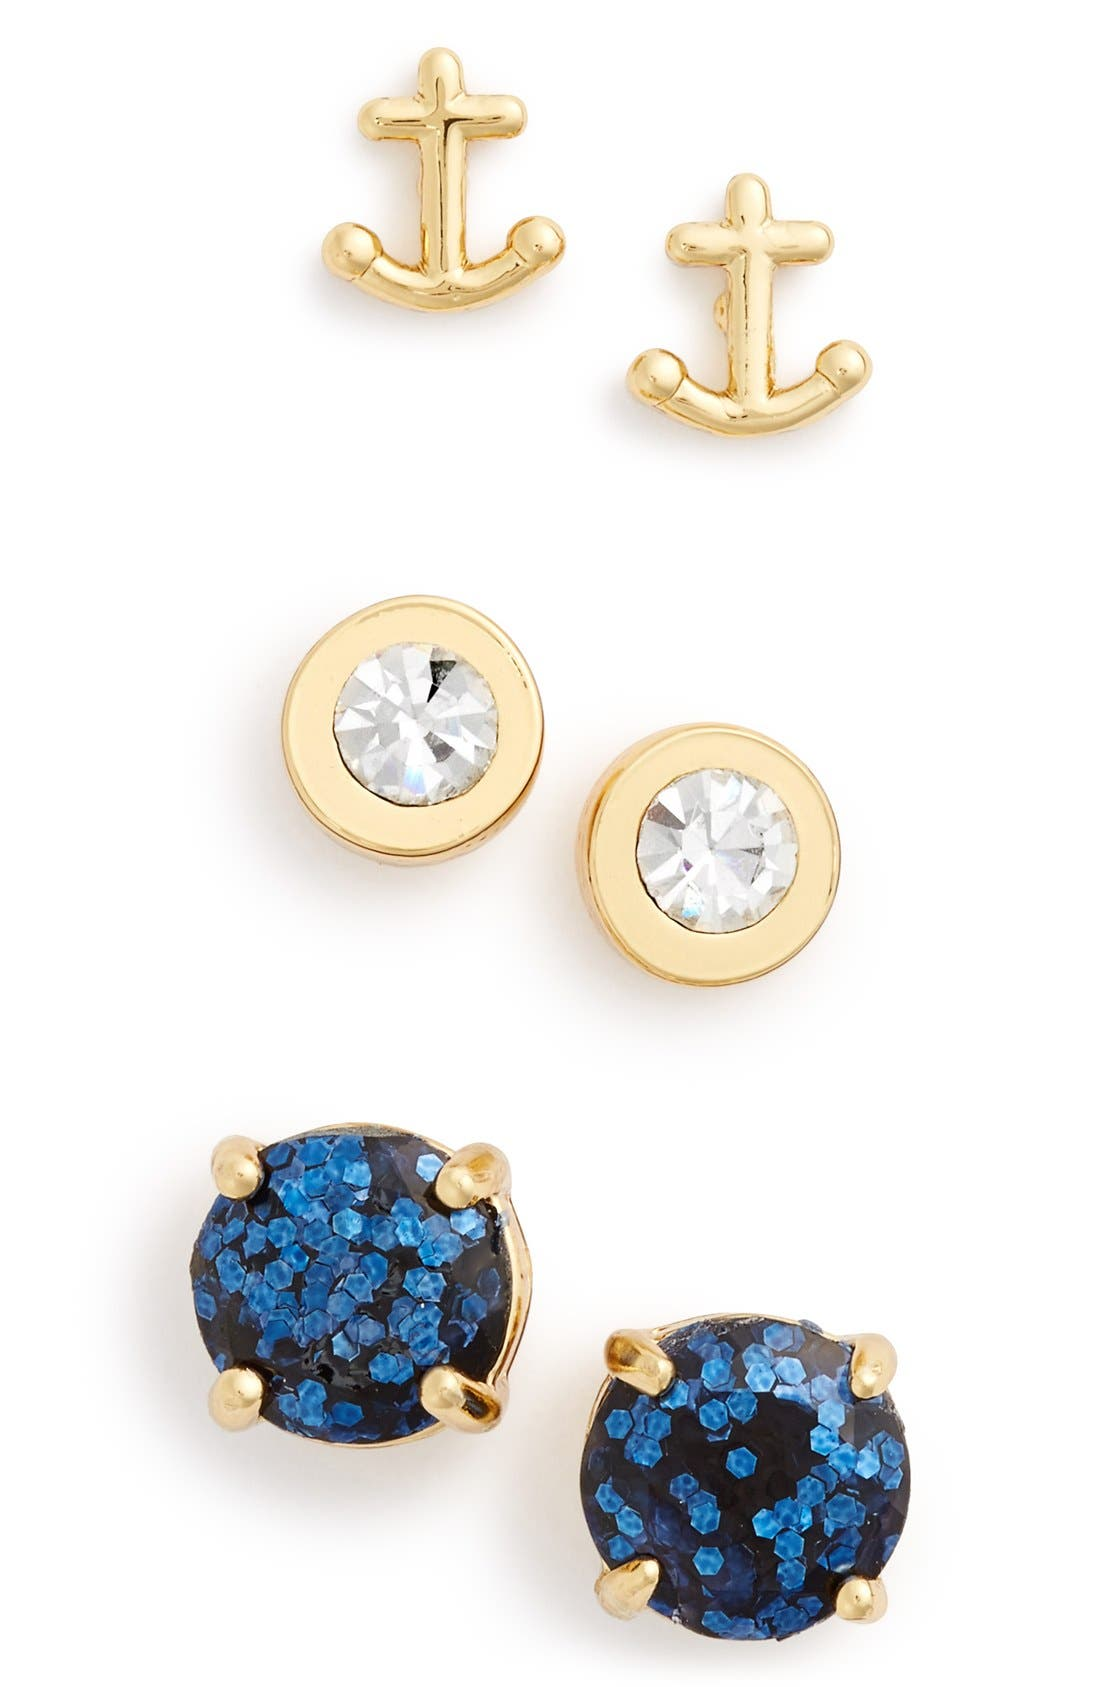 Alternate Image 1 Selected - kate spade new york 'navy glitter' anchor & round stud earrings (Set of 3)